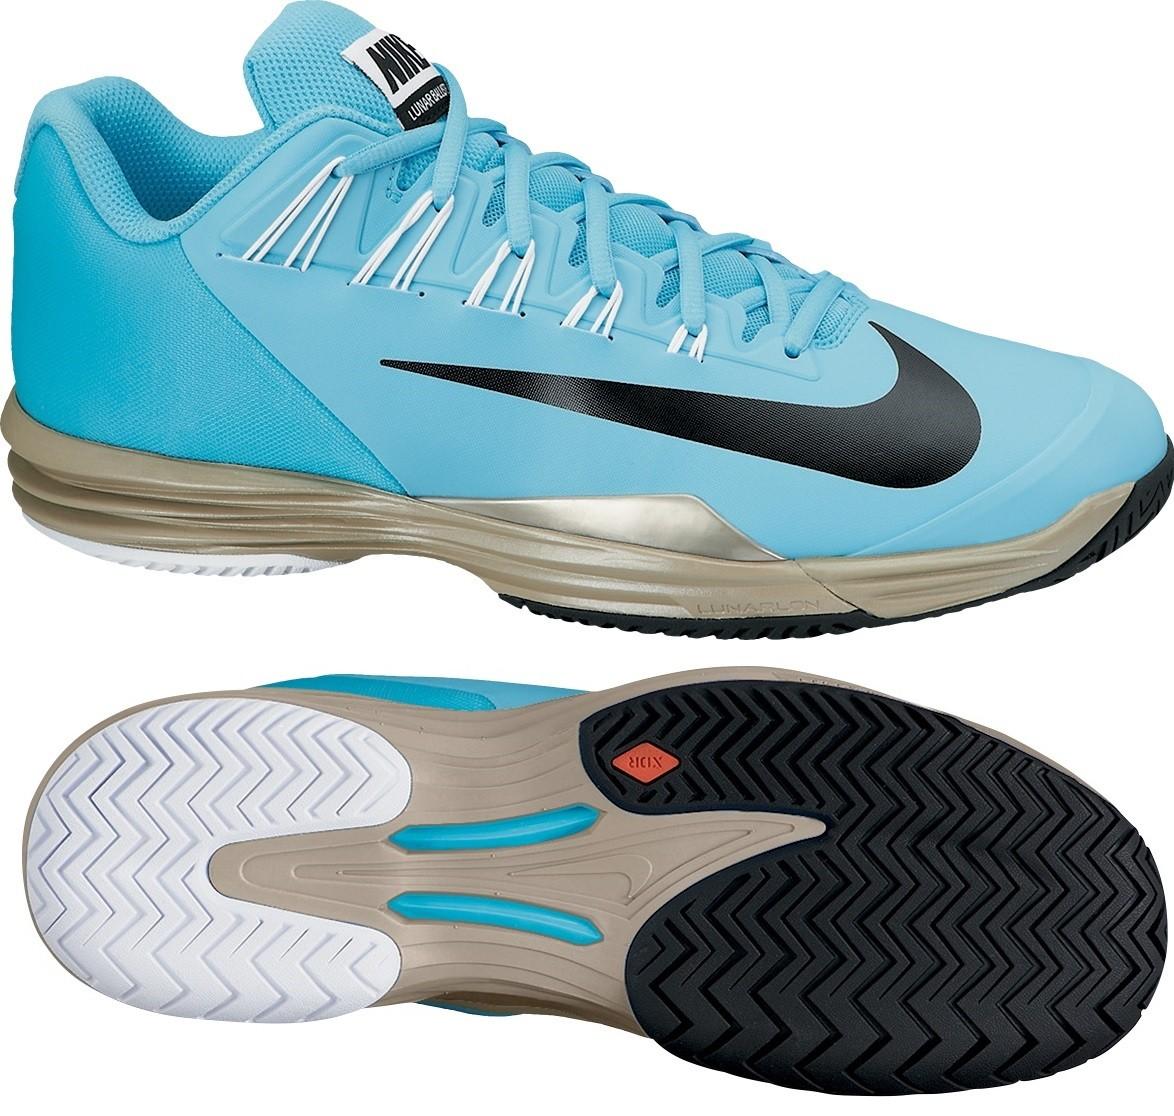 tenisová obuv NIKE LUNAR BALLISTEC modrá 631653-400 a86ae5b7d0e